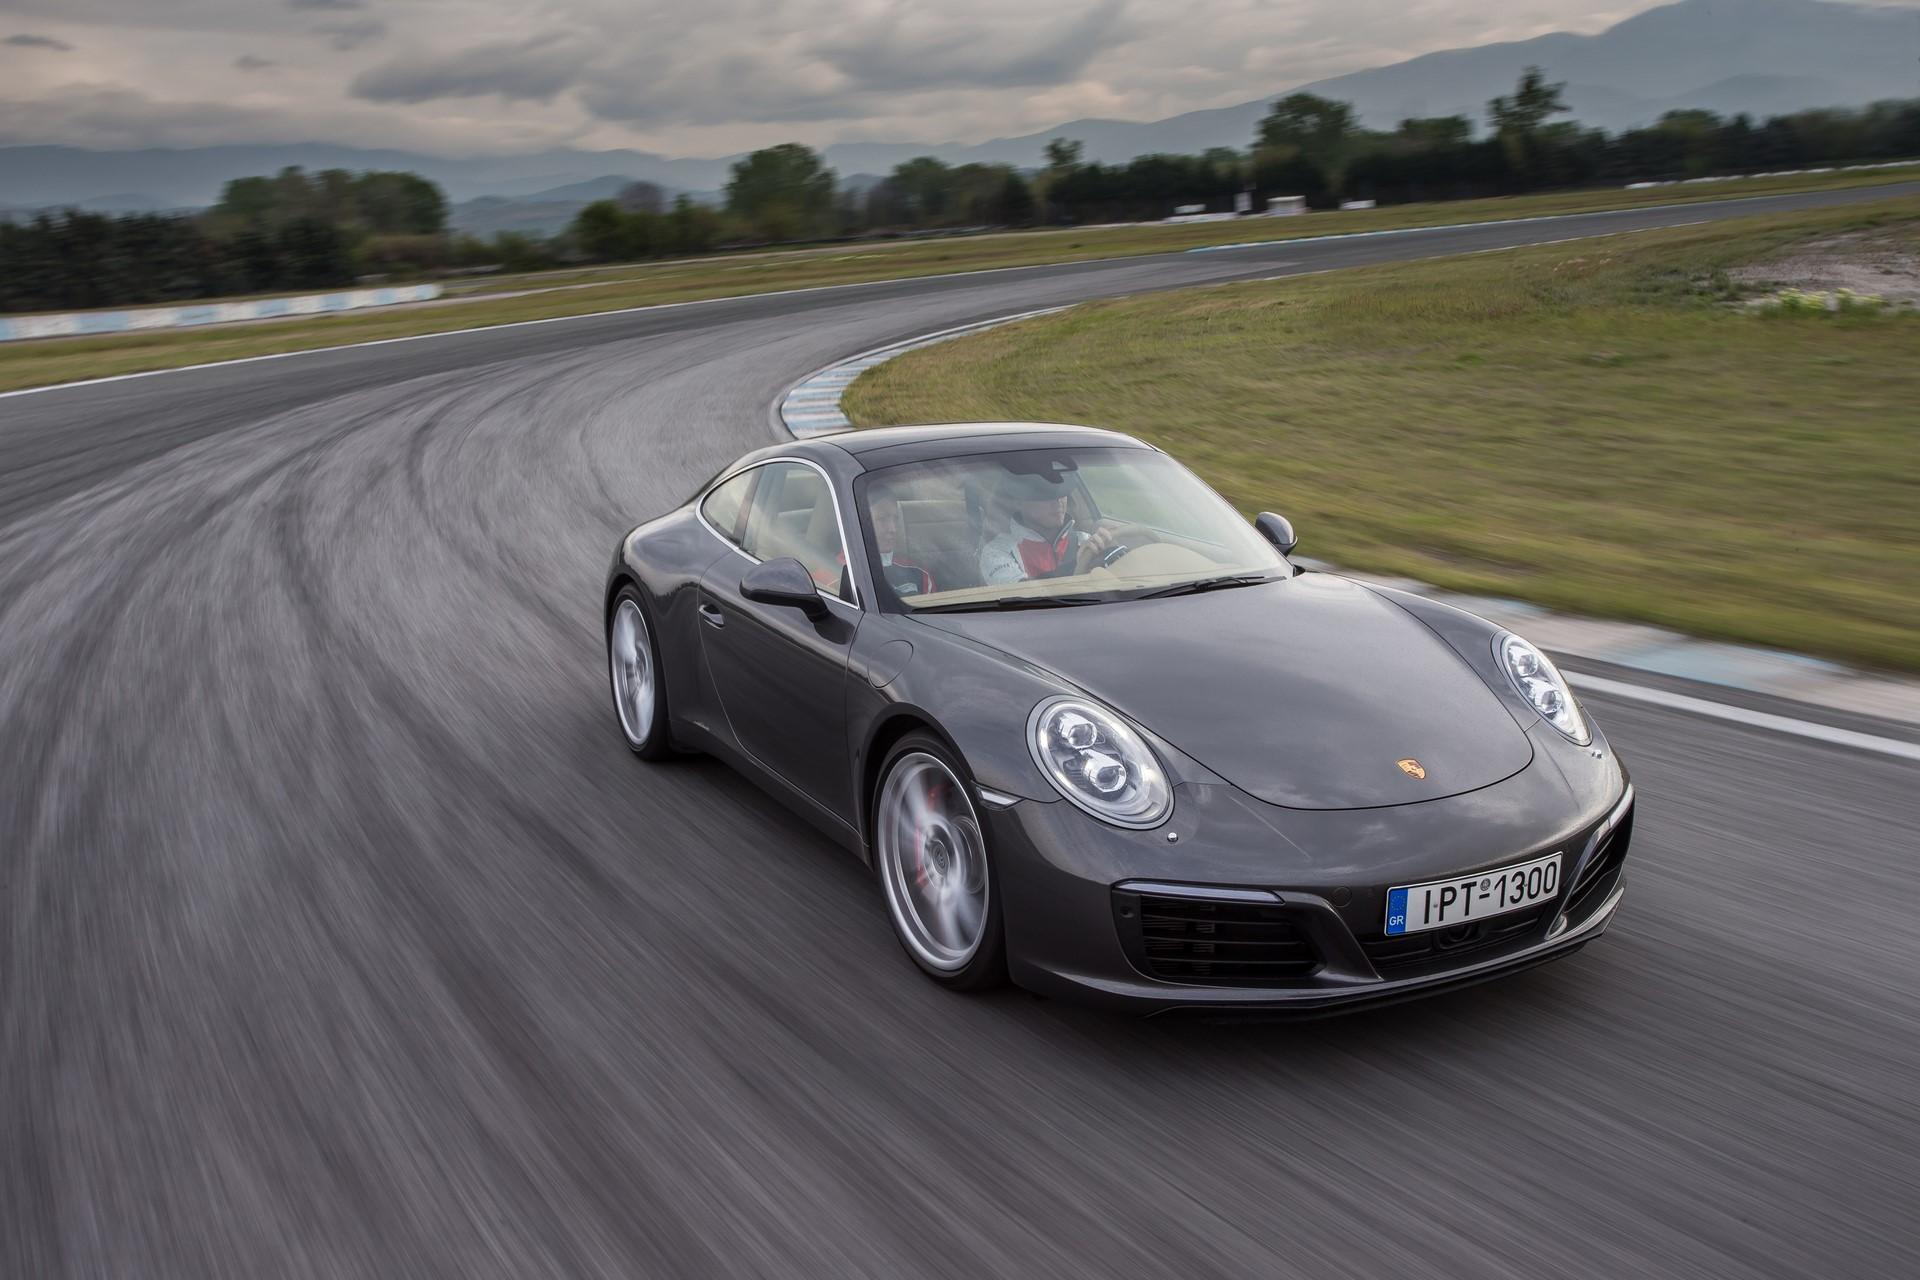 Porsche Driving Experience 2017 Serres (52)